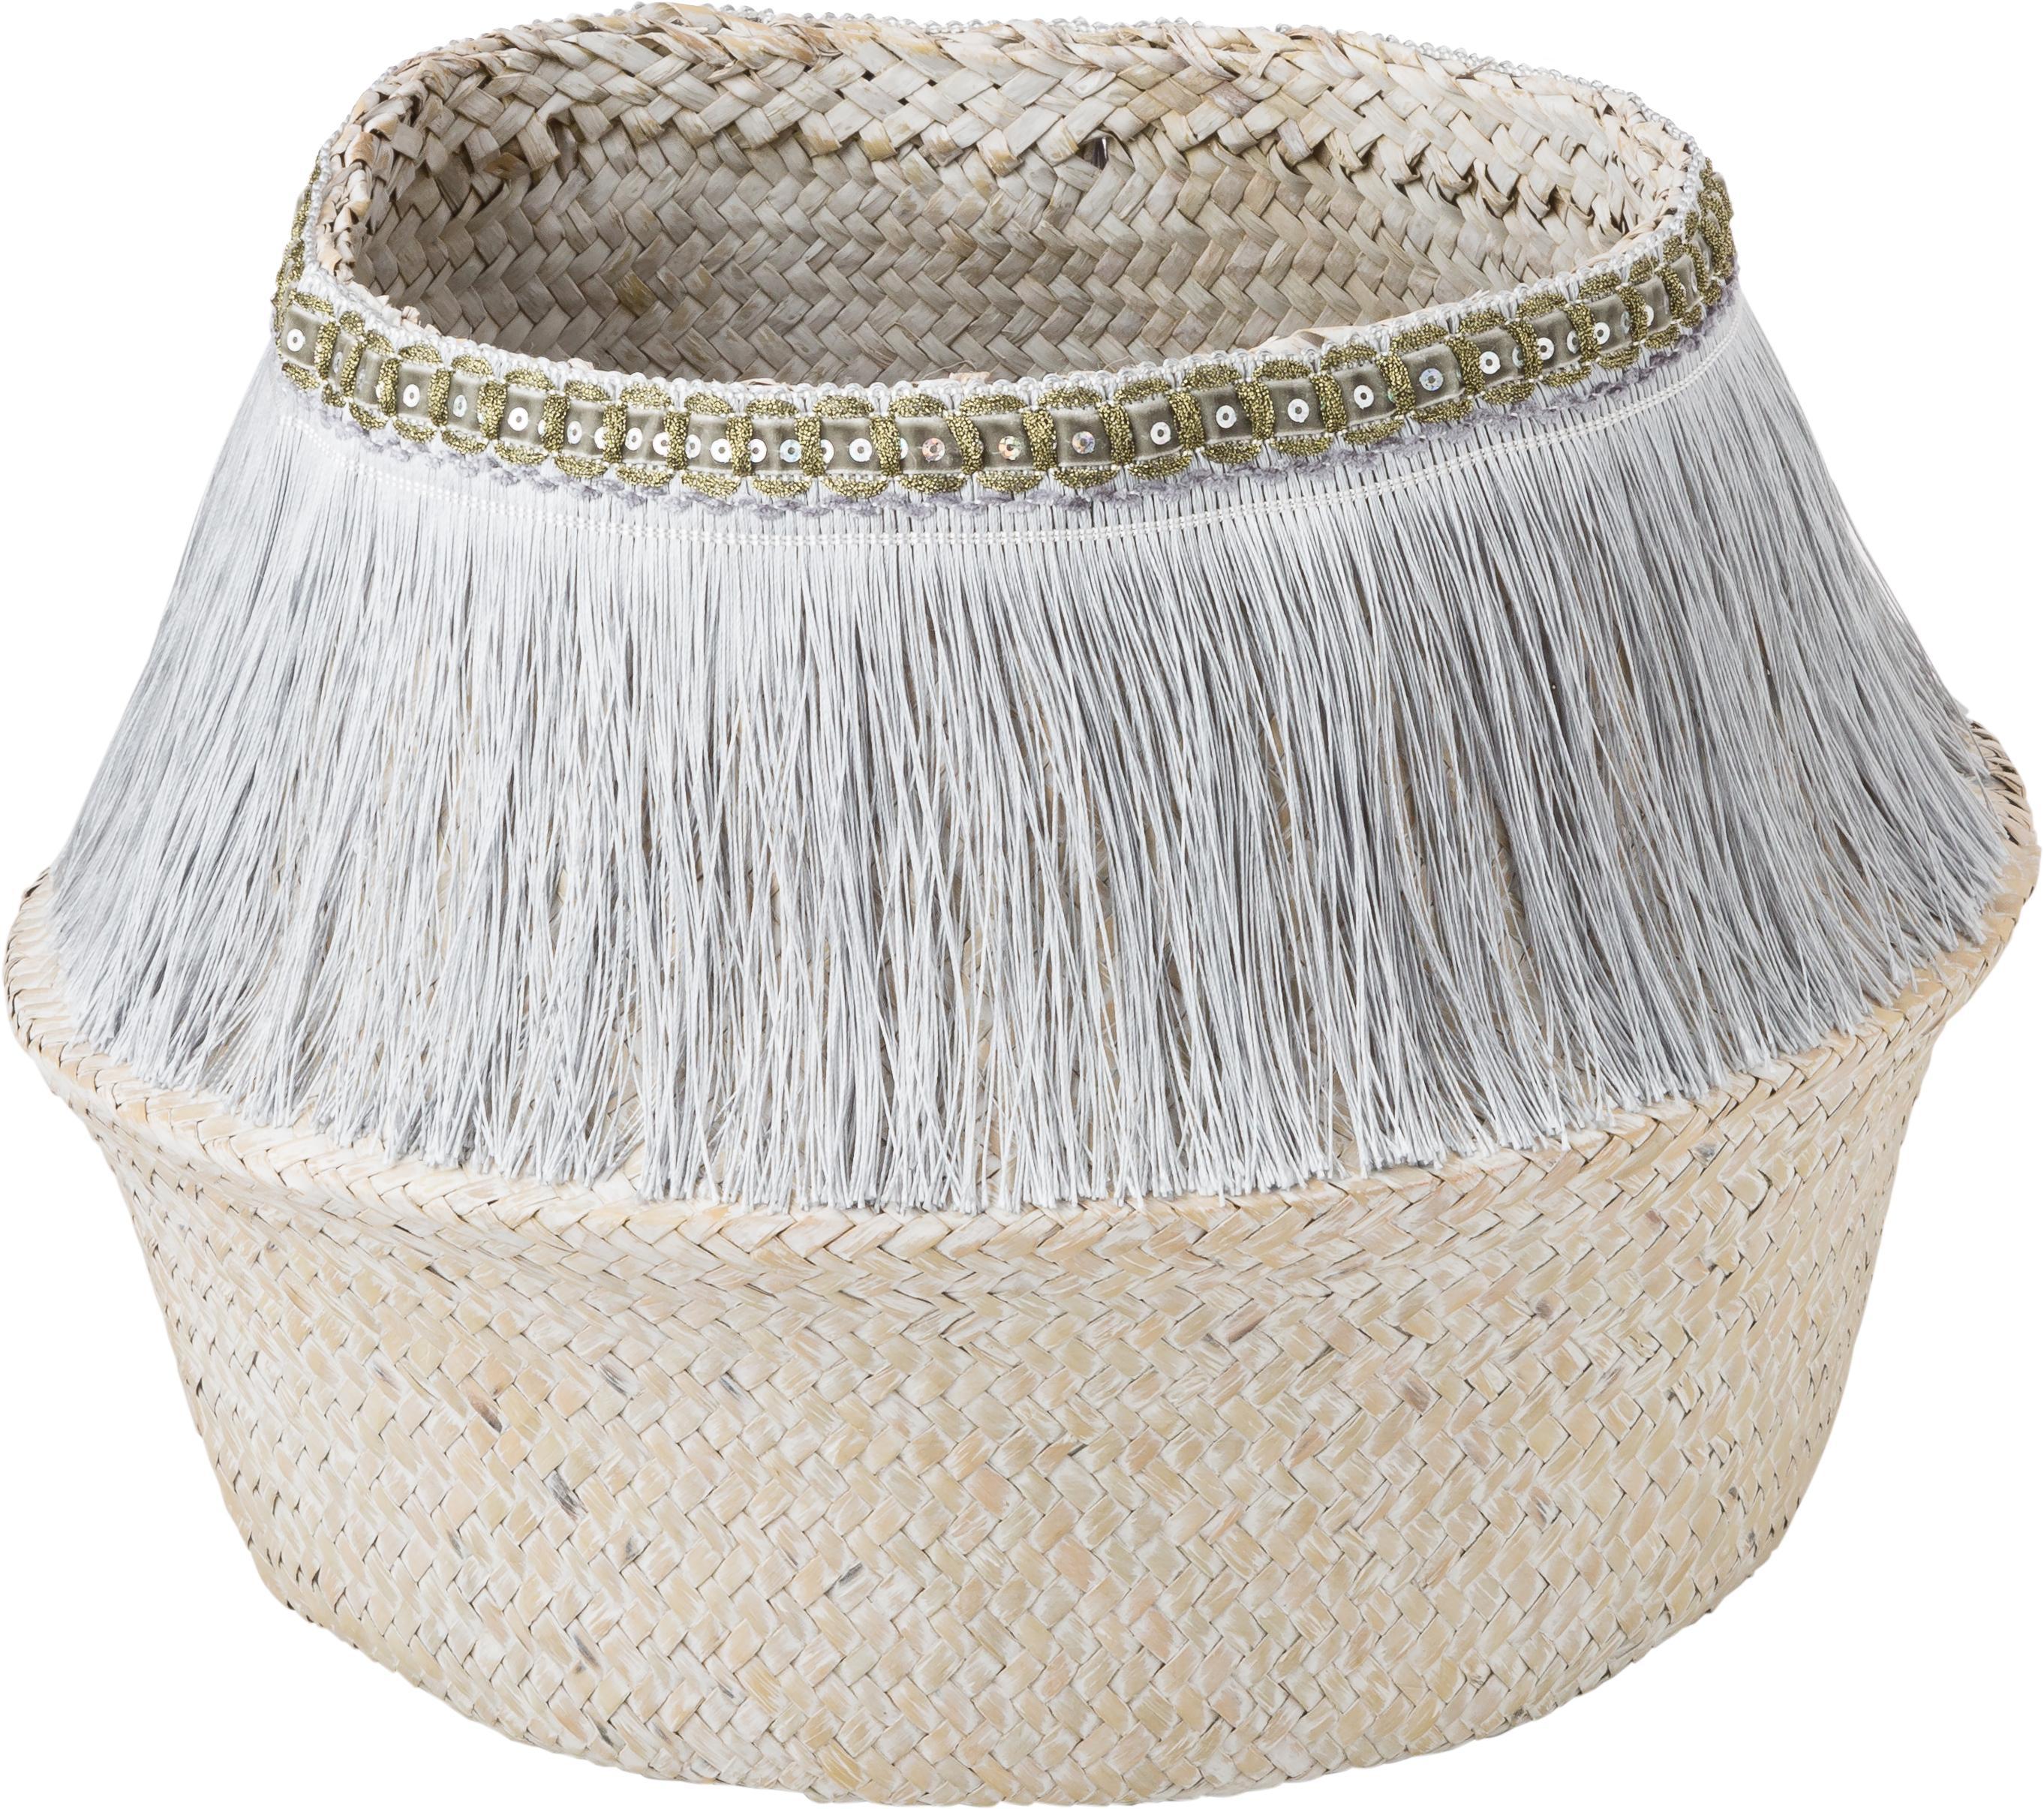 Cesta artesanal Frans, Cesta: algas, Flecos: poliéster, Plateado, blanco, Ø 35 x Al 25 cm